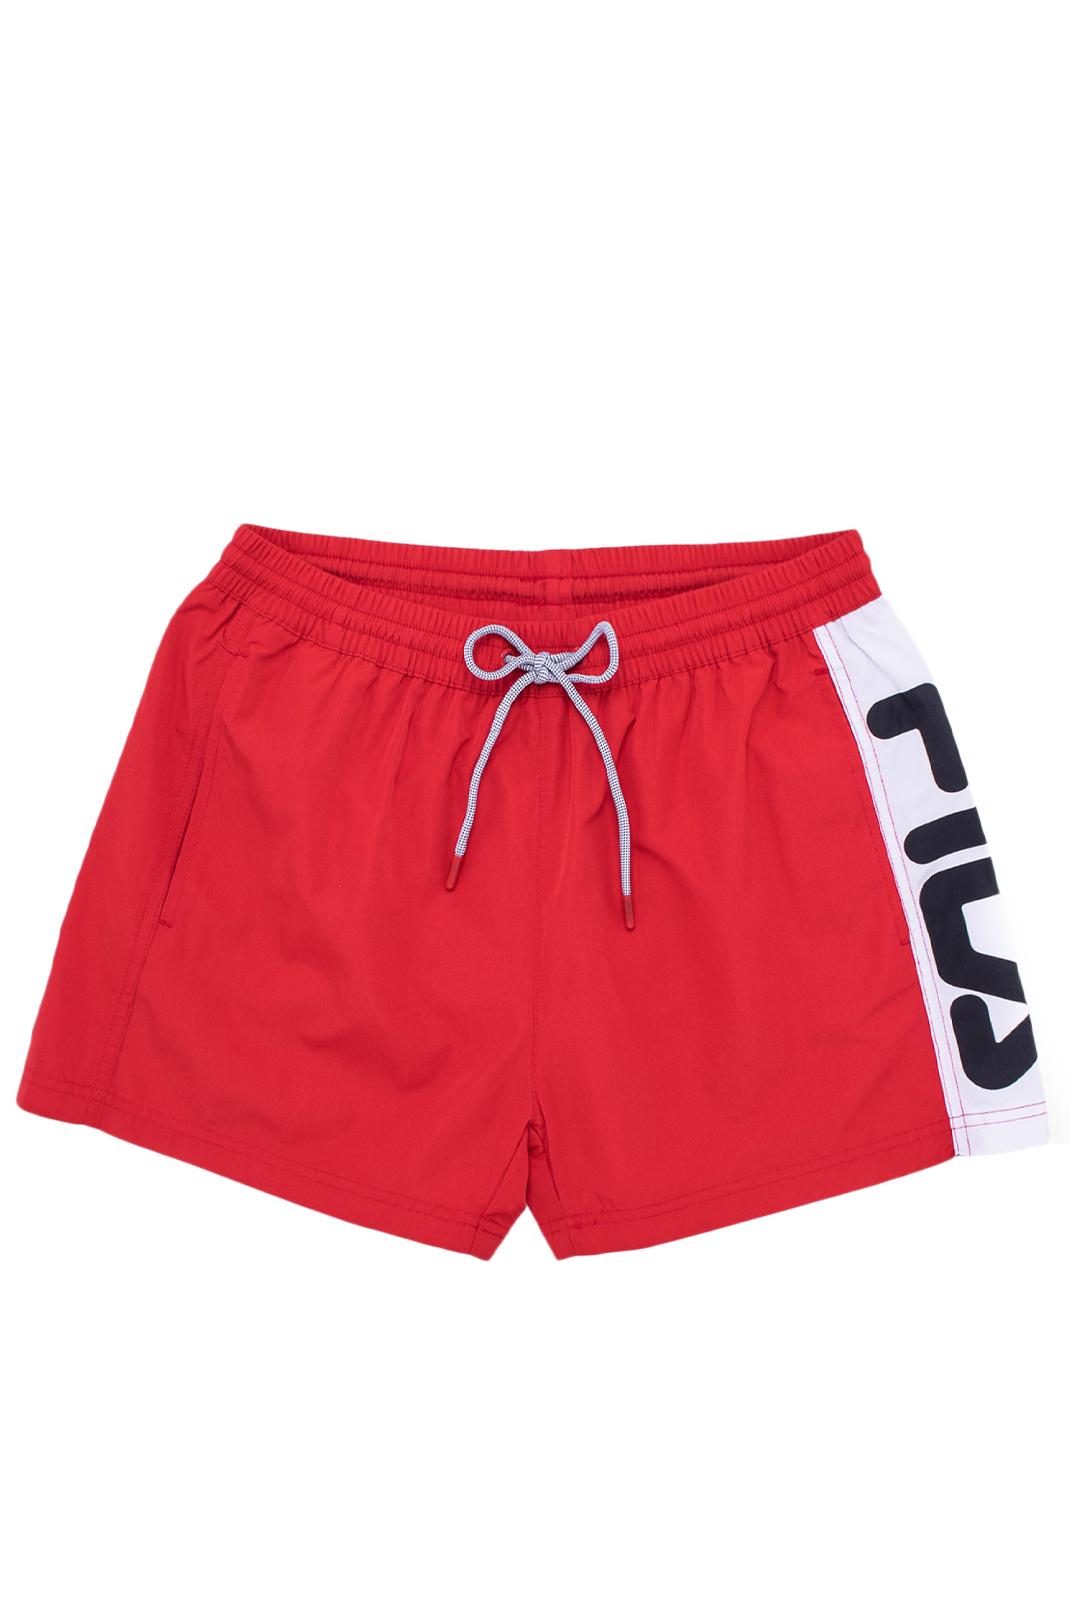 Shorts de bain  Fila 687205 G12